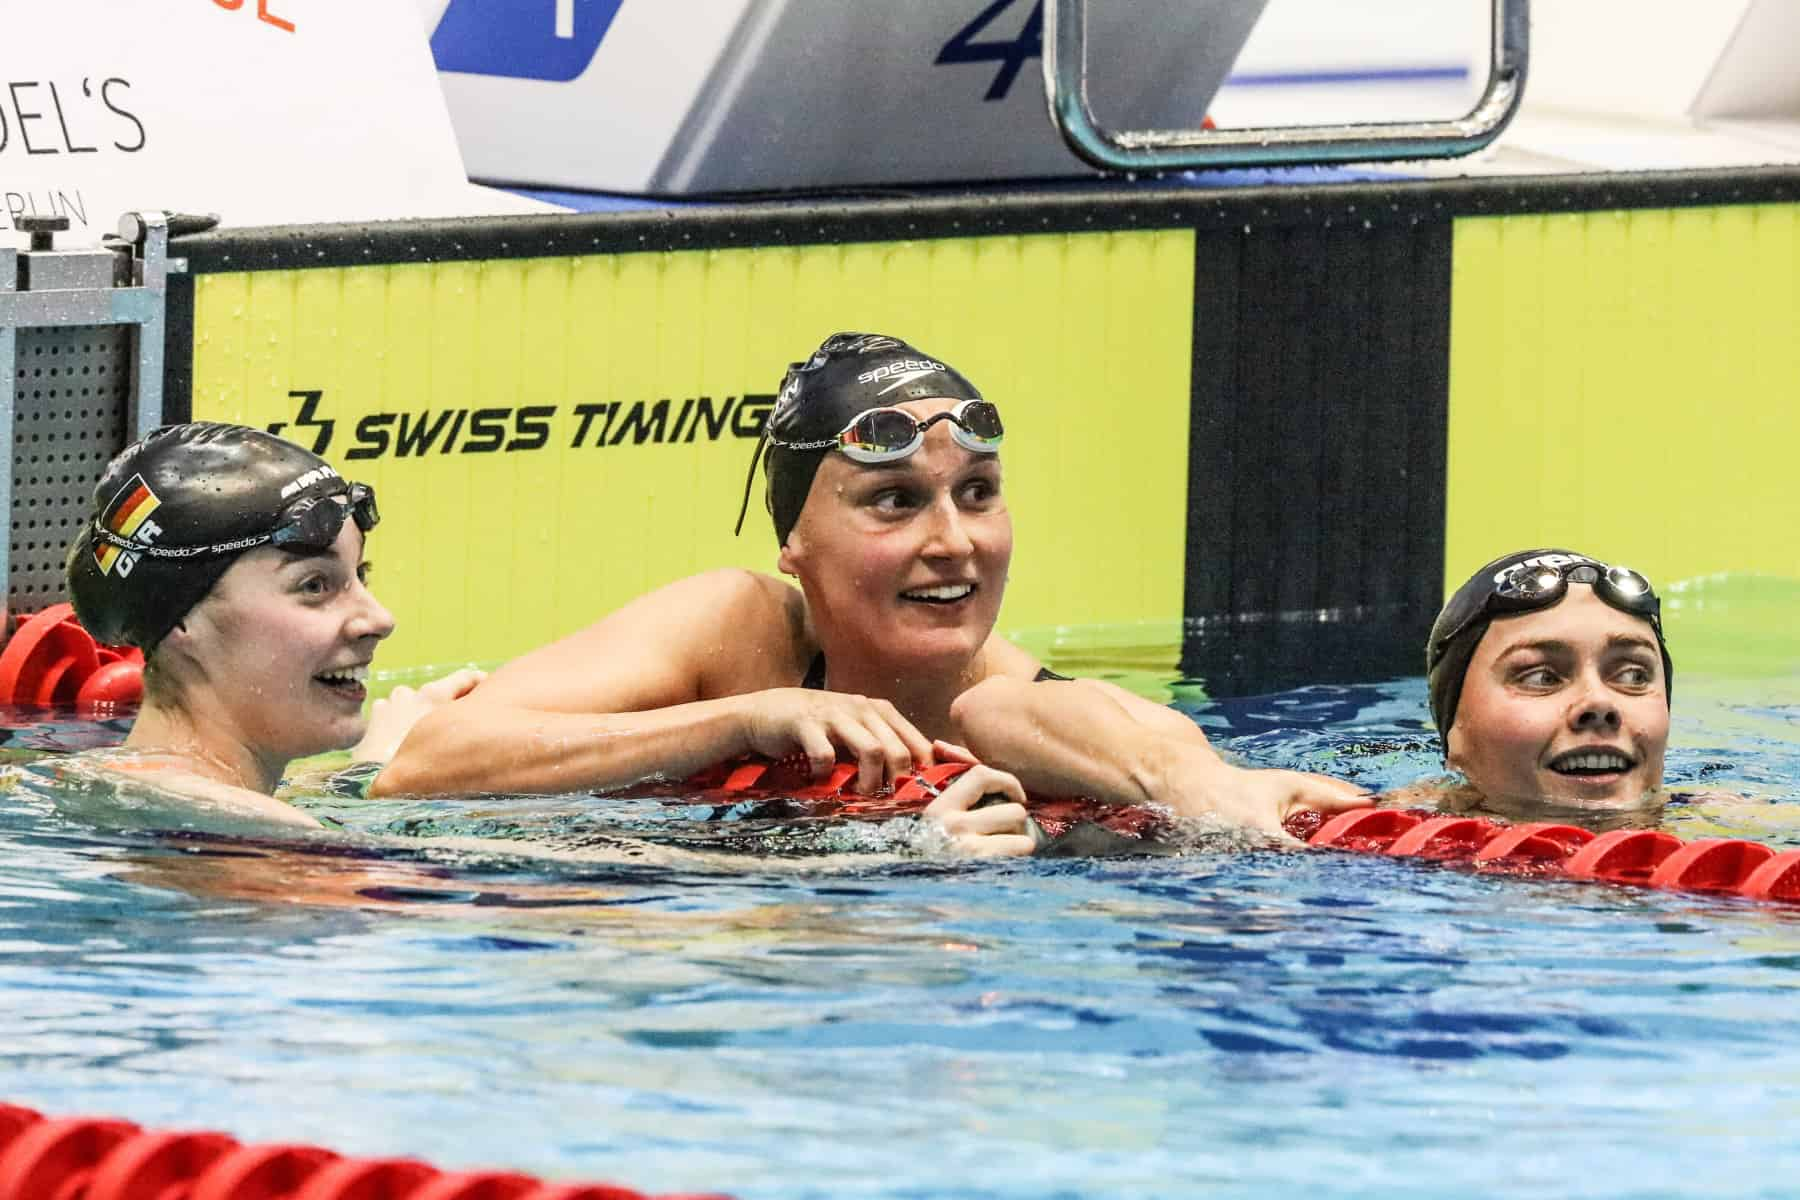 Über 100 Meter wird es ganz eng: Nach 53 Sekunden hat Annika Bruhn ihre Hand als Erste an der Wand. Silber geht an Lisa Höpink (links), Bronze an Jessica Steiger.